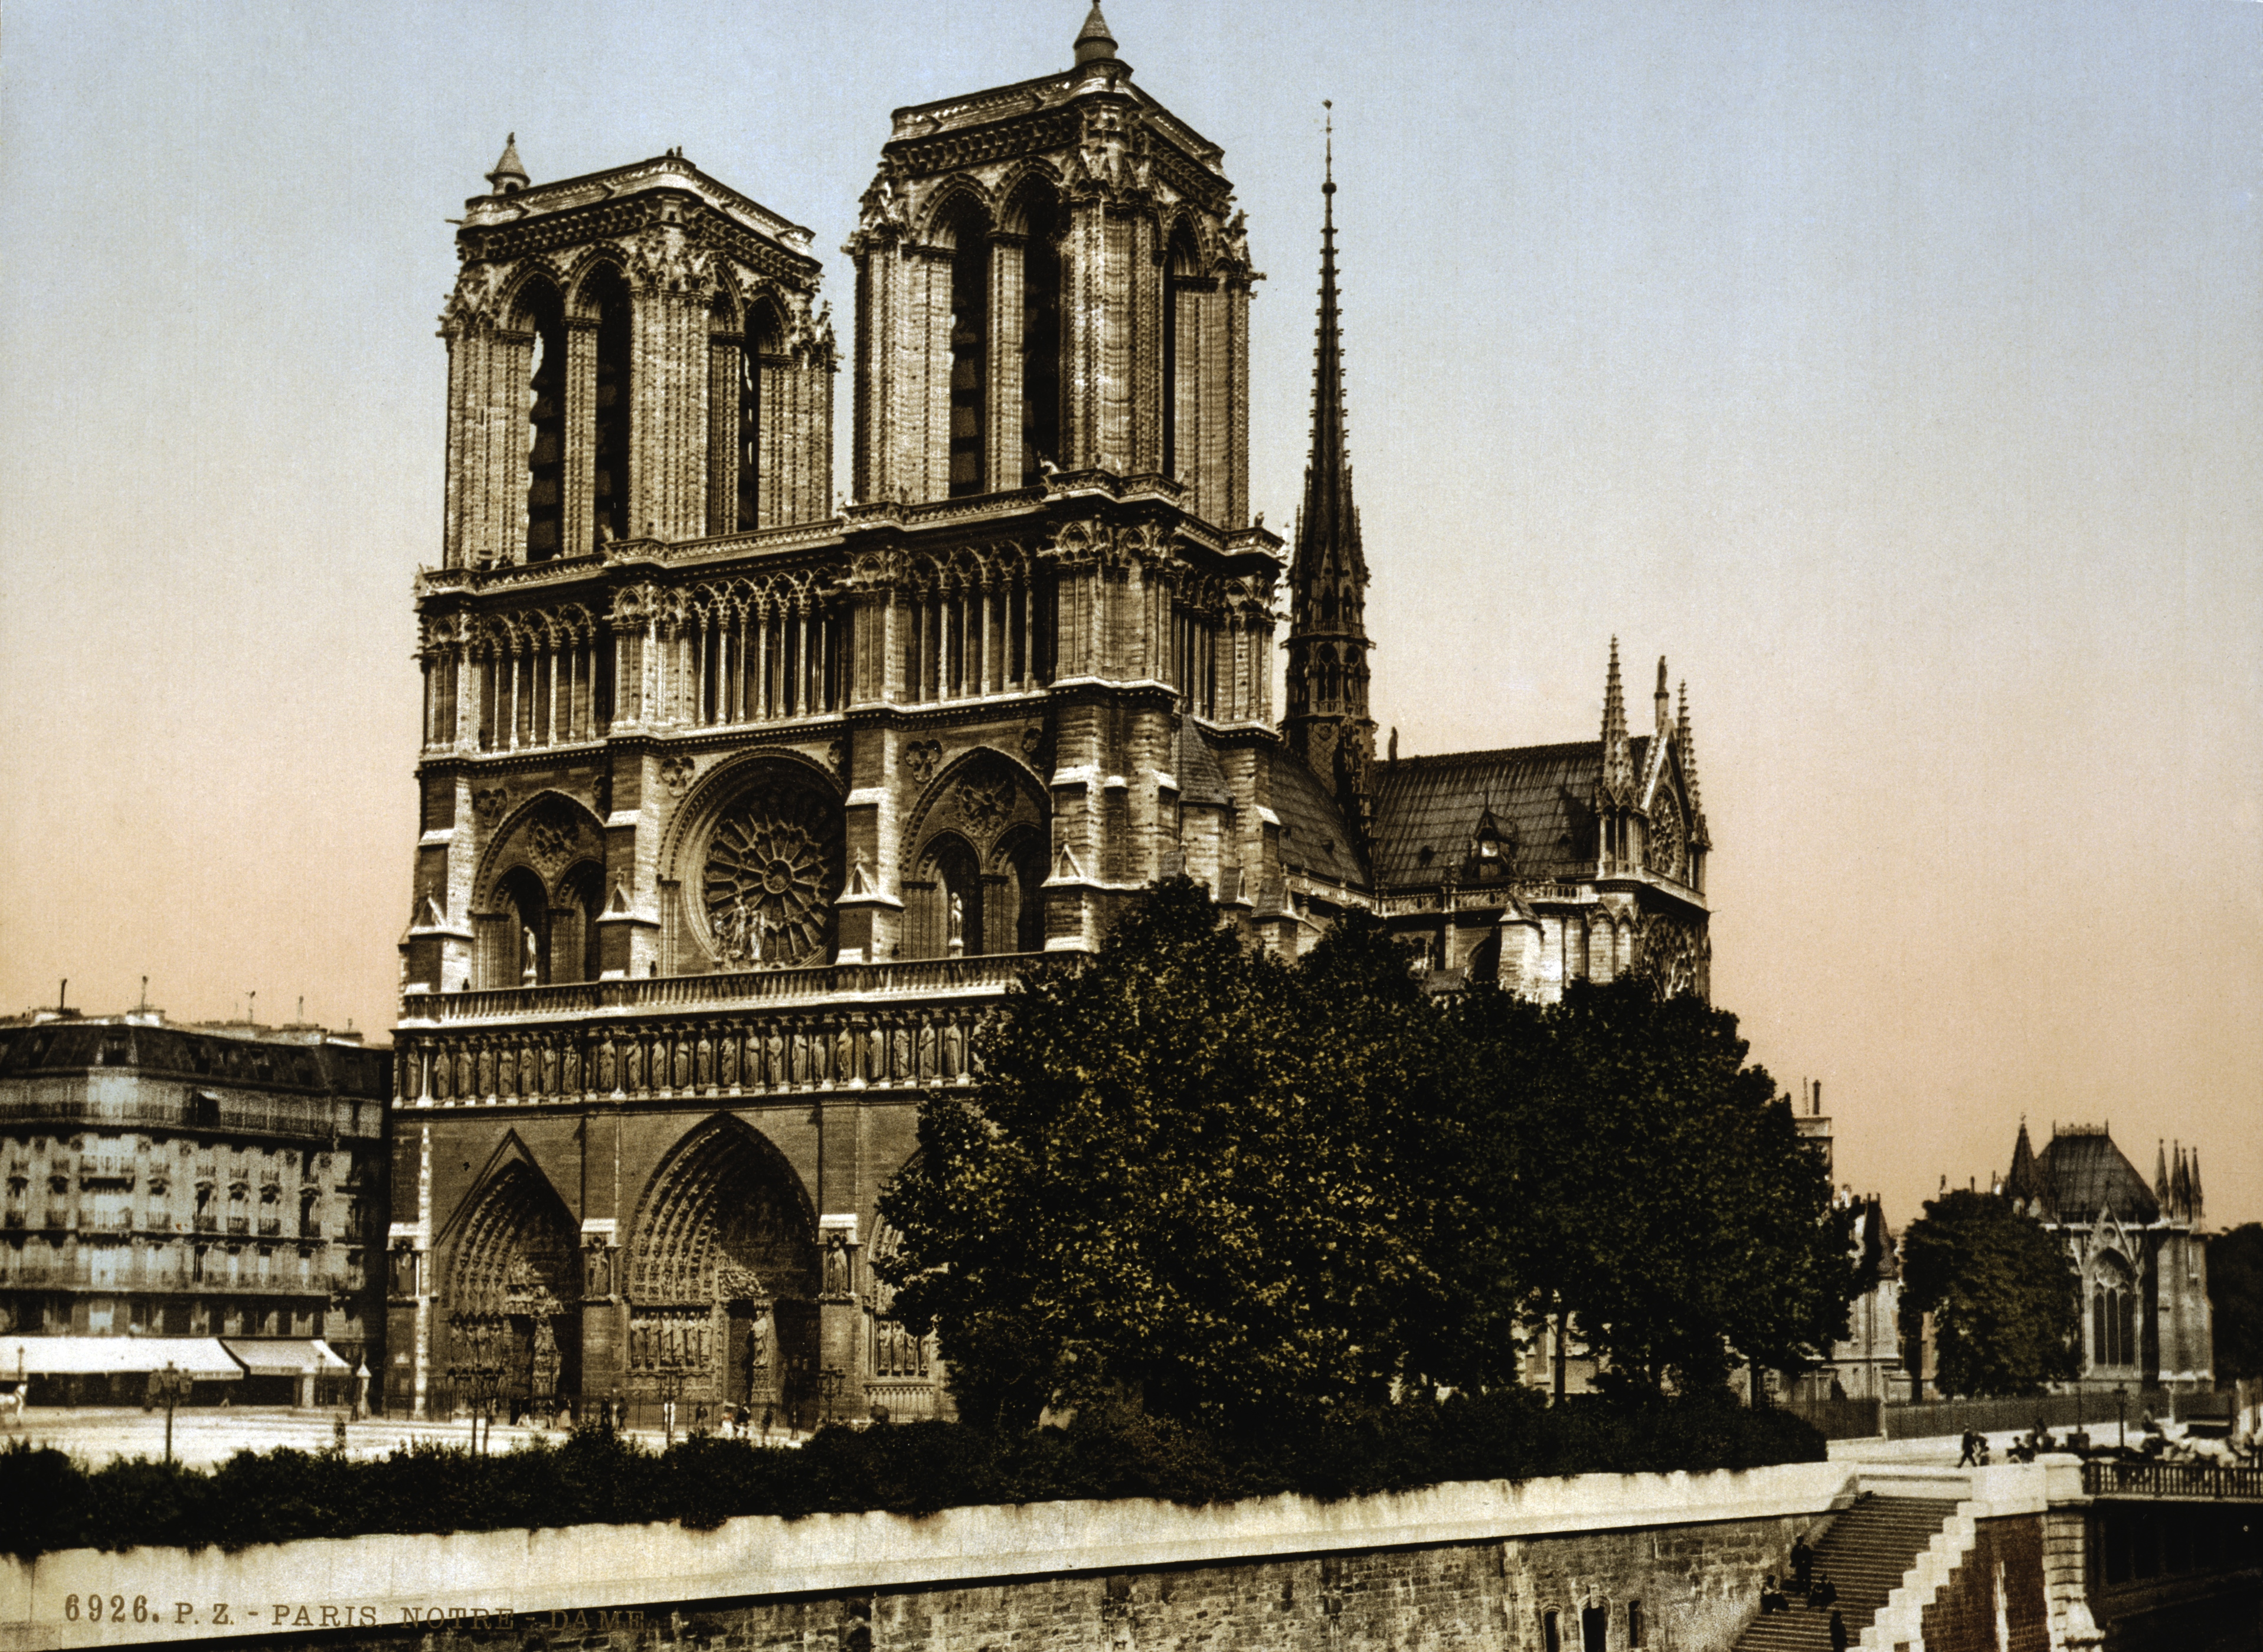 FileNotre Dame Paris France Ca 1890 1900jpg